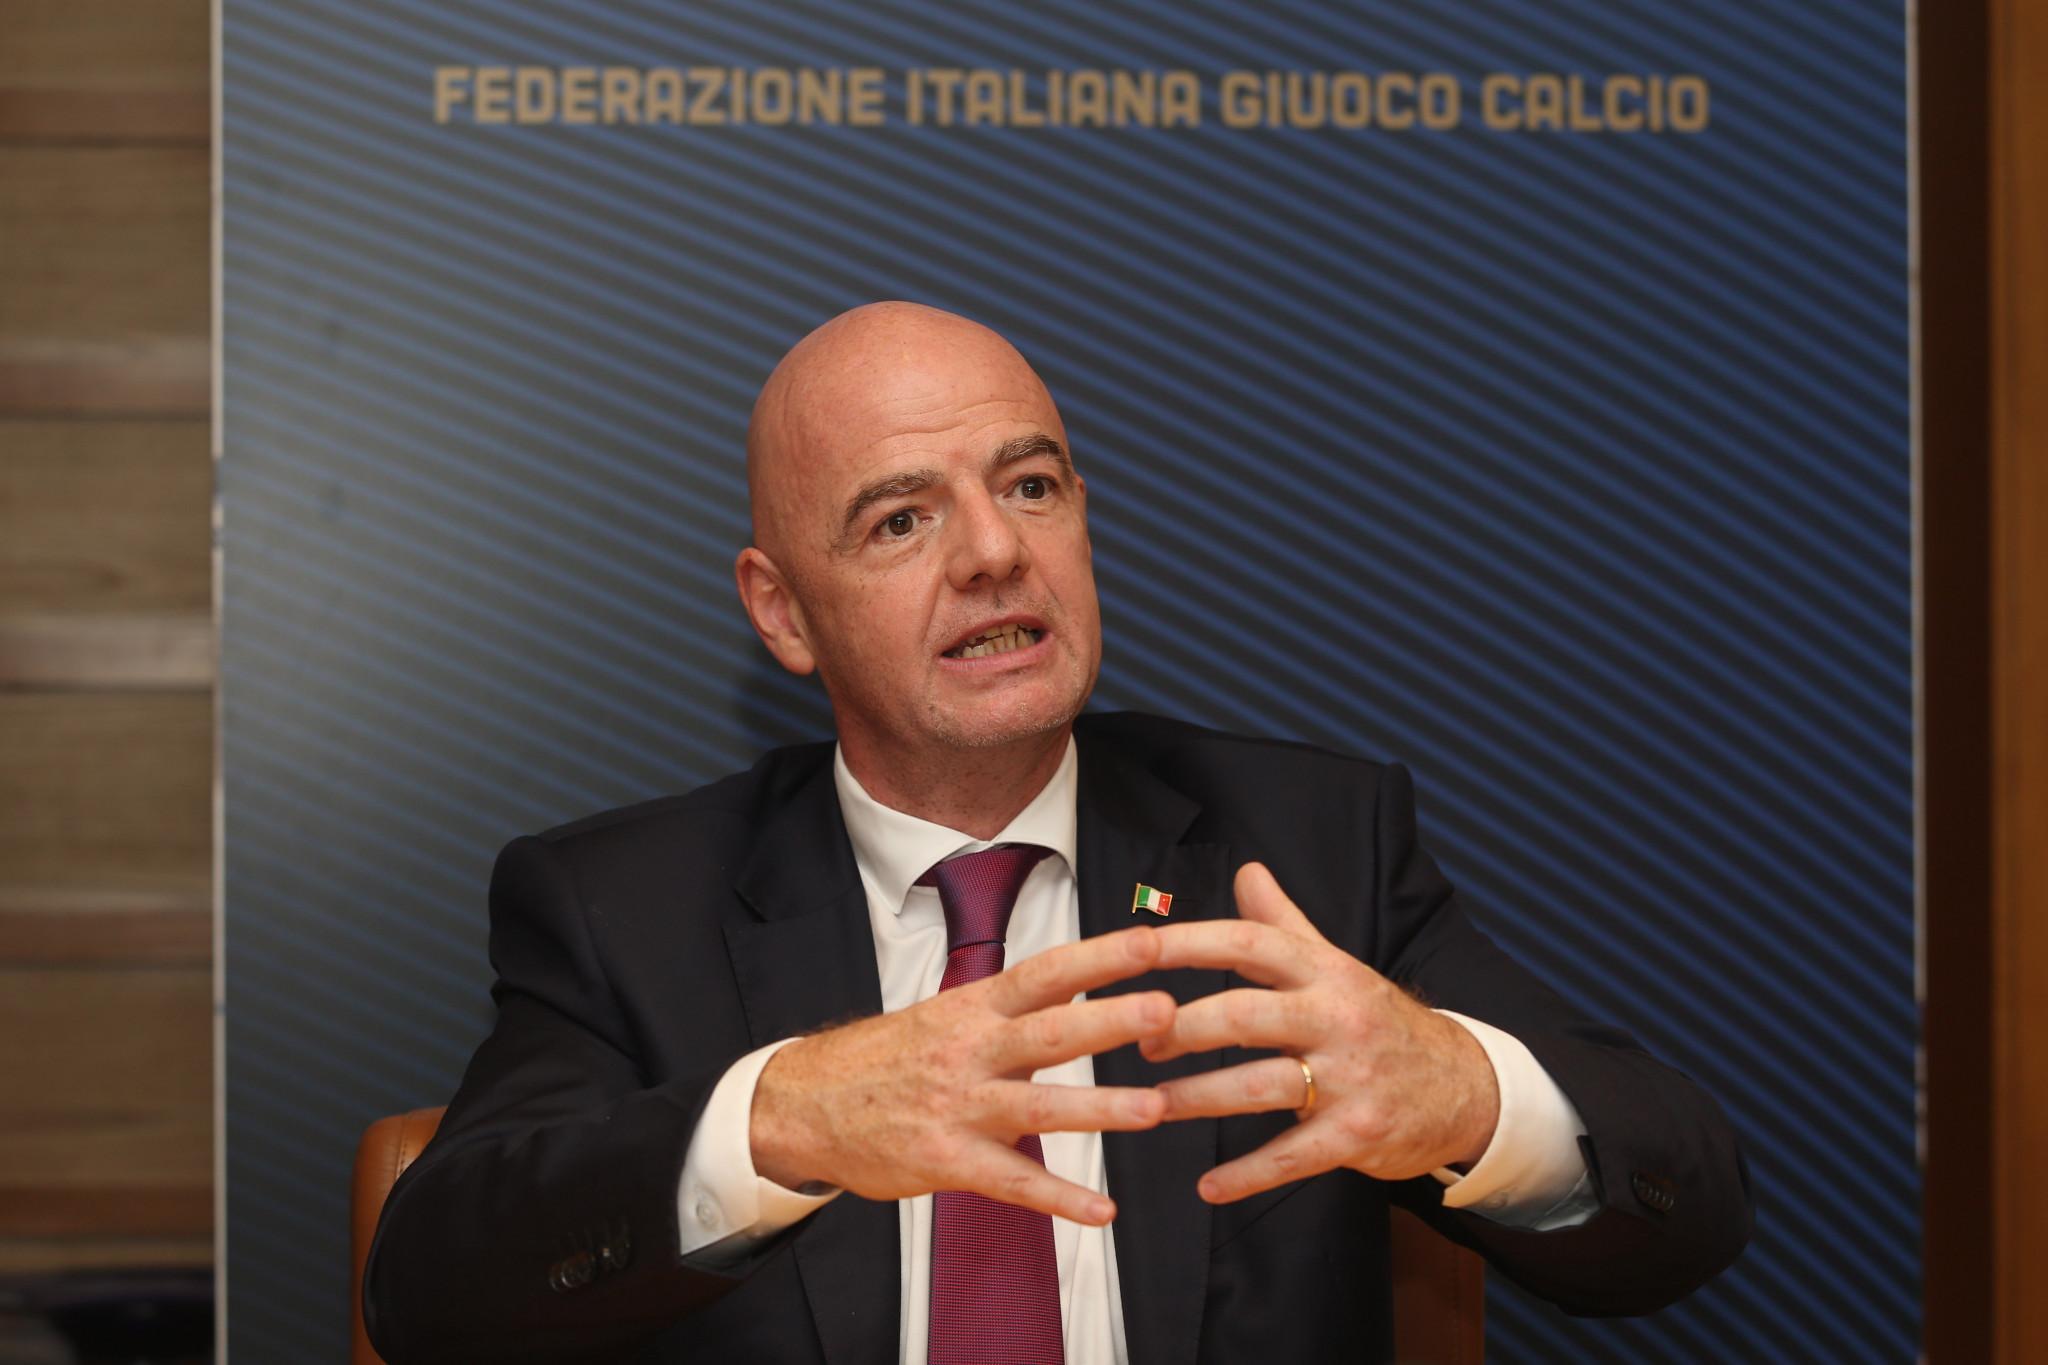 FIFA President Gianni Infantino has said the establishment of the Global Integrity Programme is